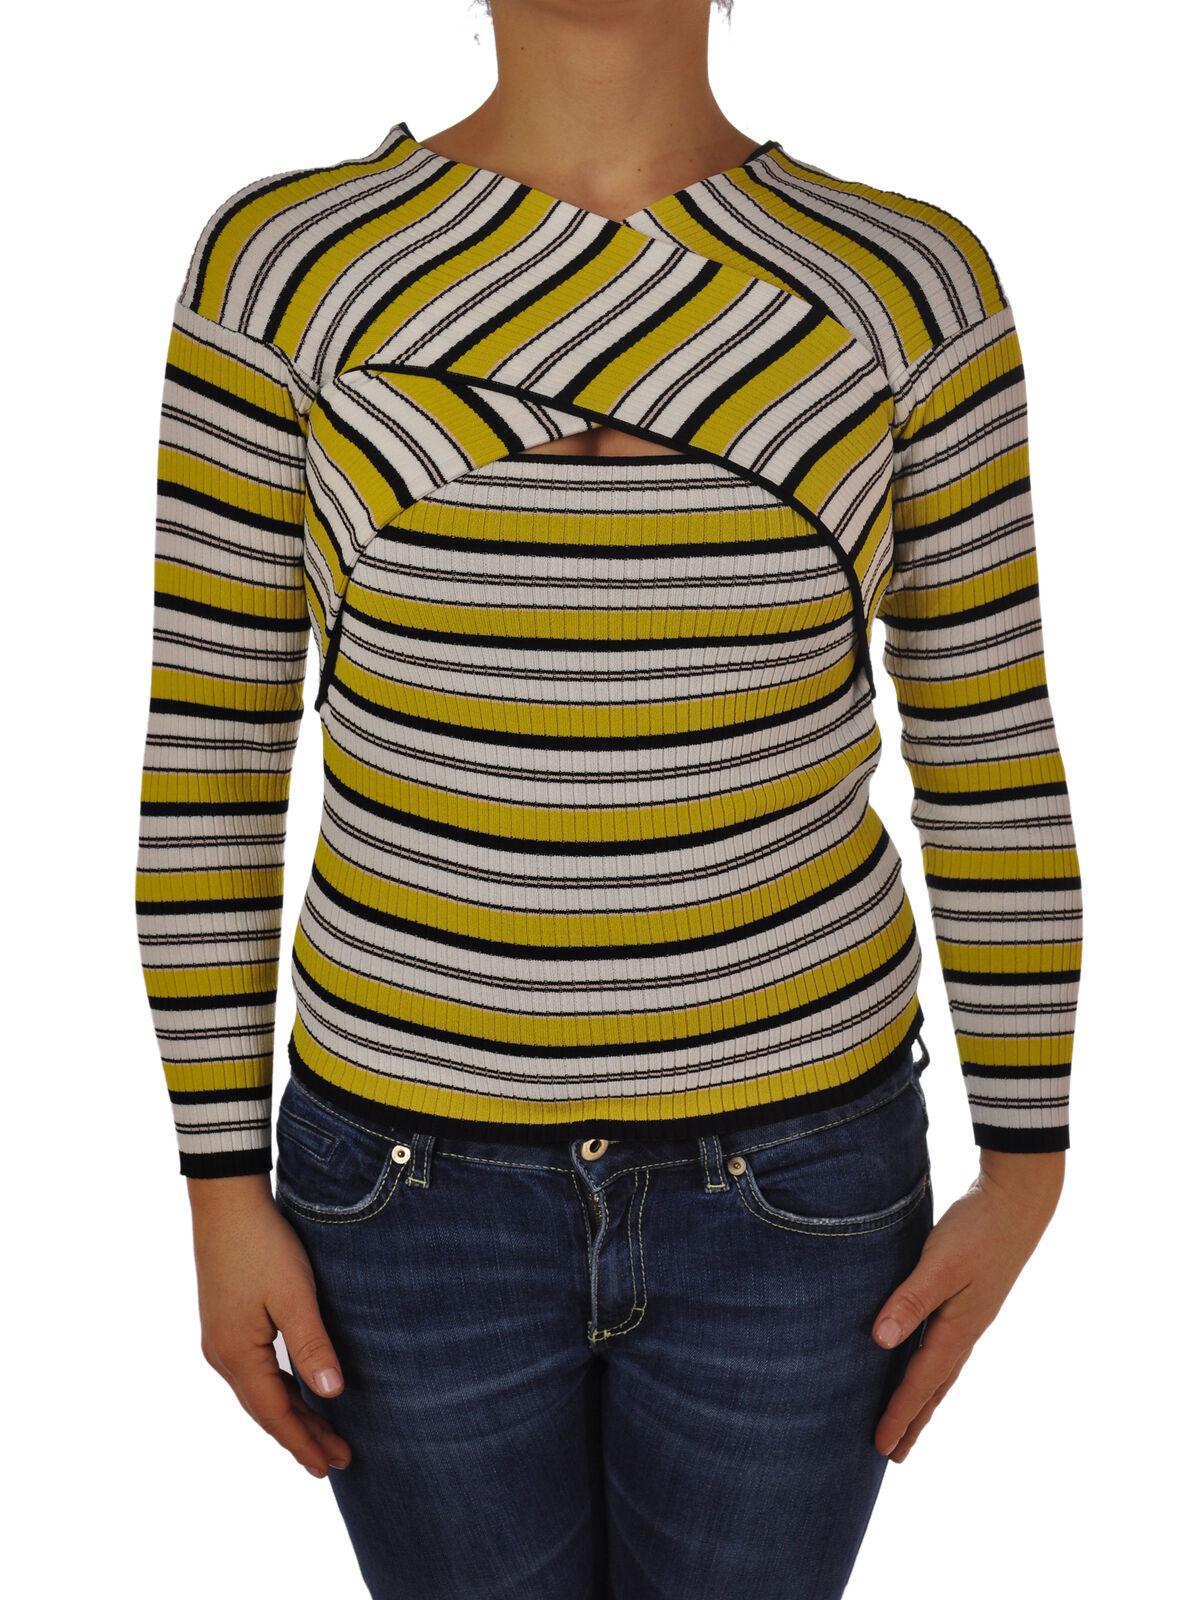 Patrizia Pepe - Knitwear-Sweaters - Woman - Fantasy - 4793018B184139